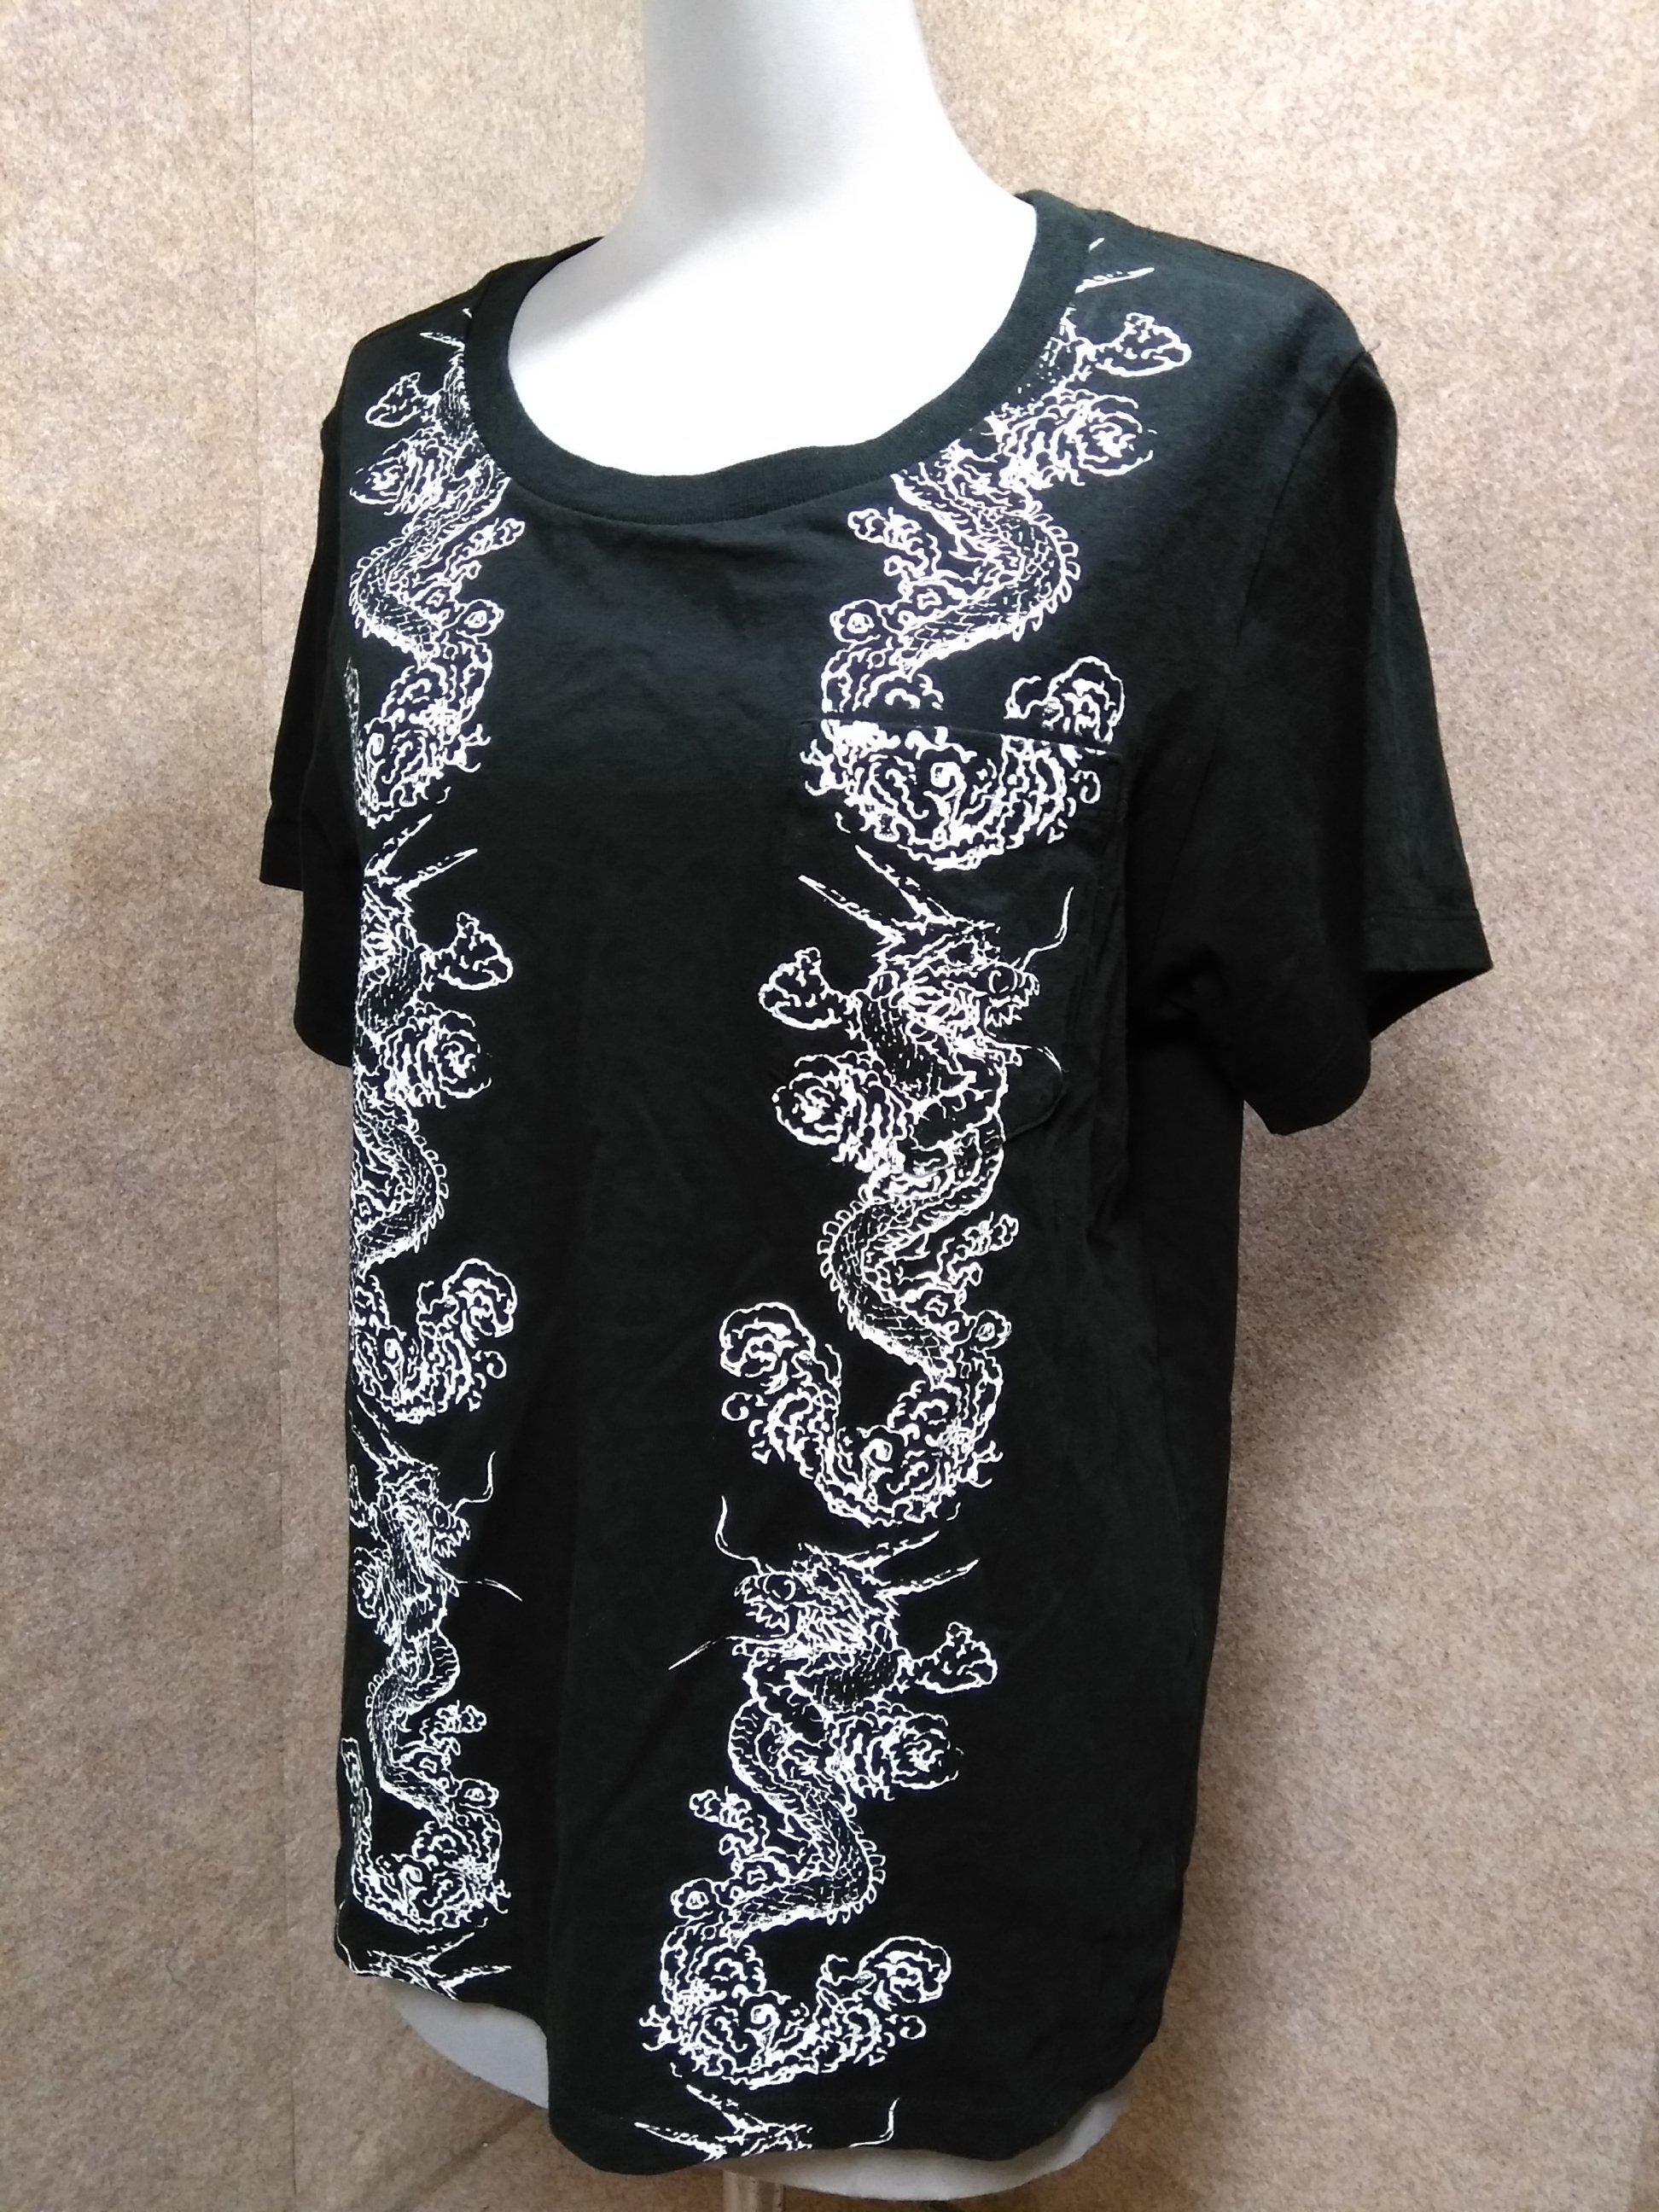 AVIREX アヴィレックス Tシャツ F ドラゴン 黒 胸ポケ u1397j